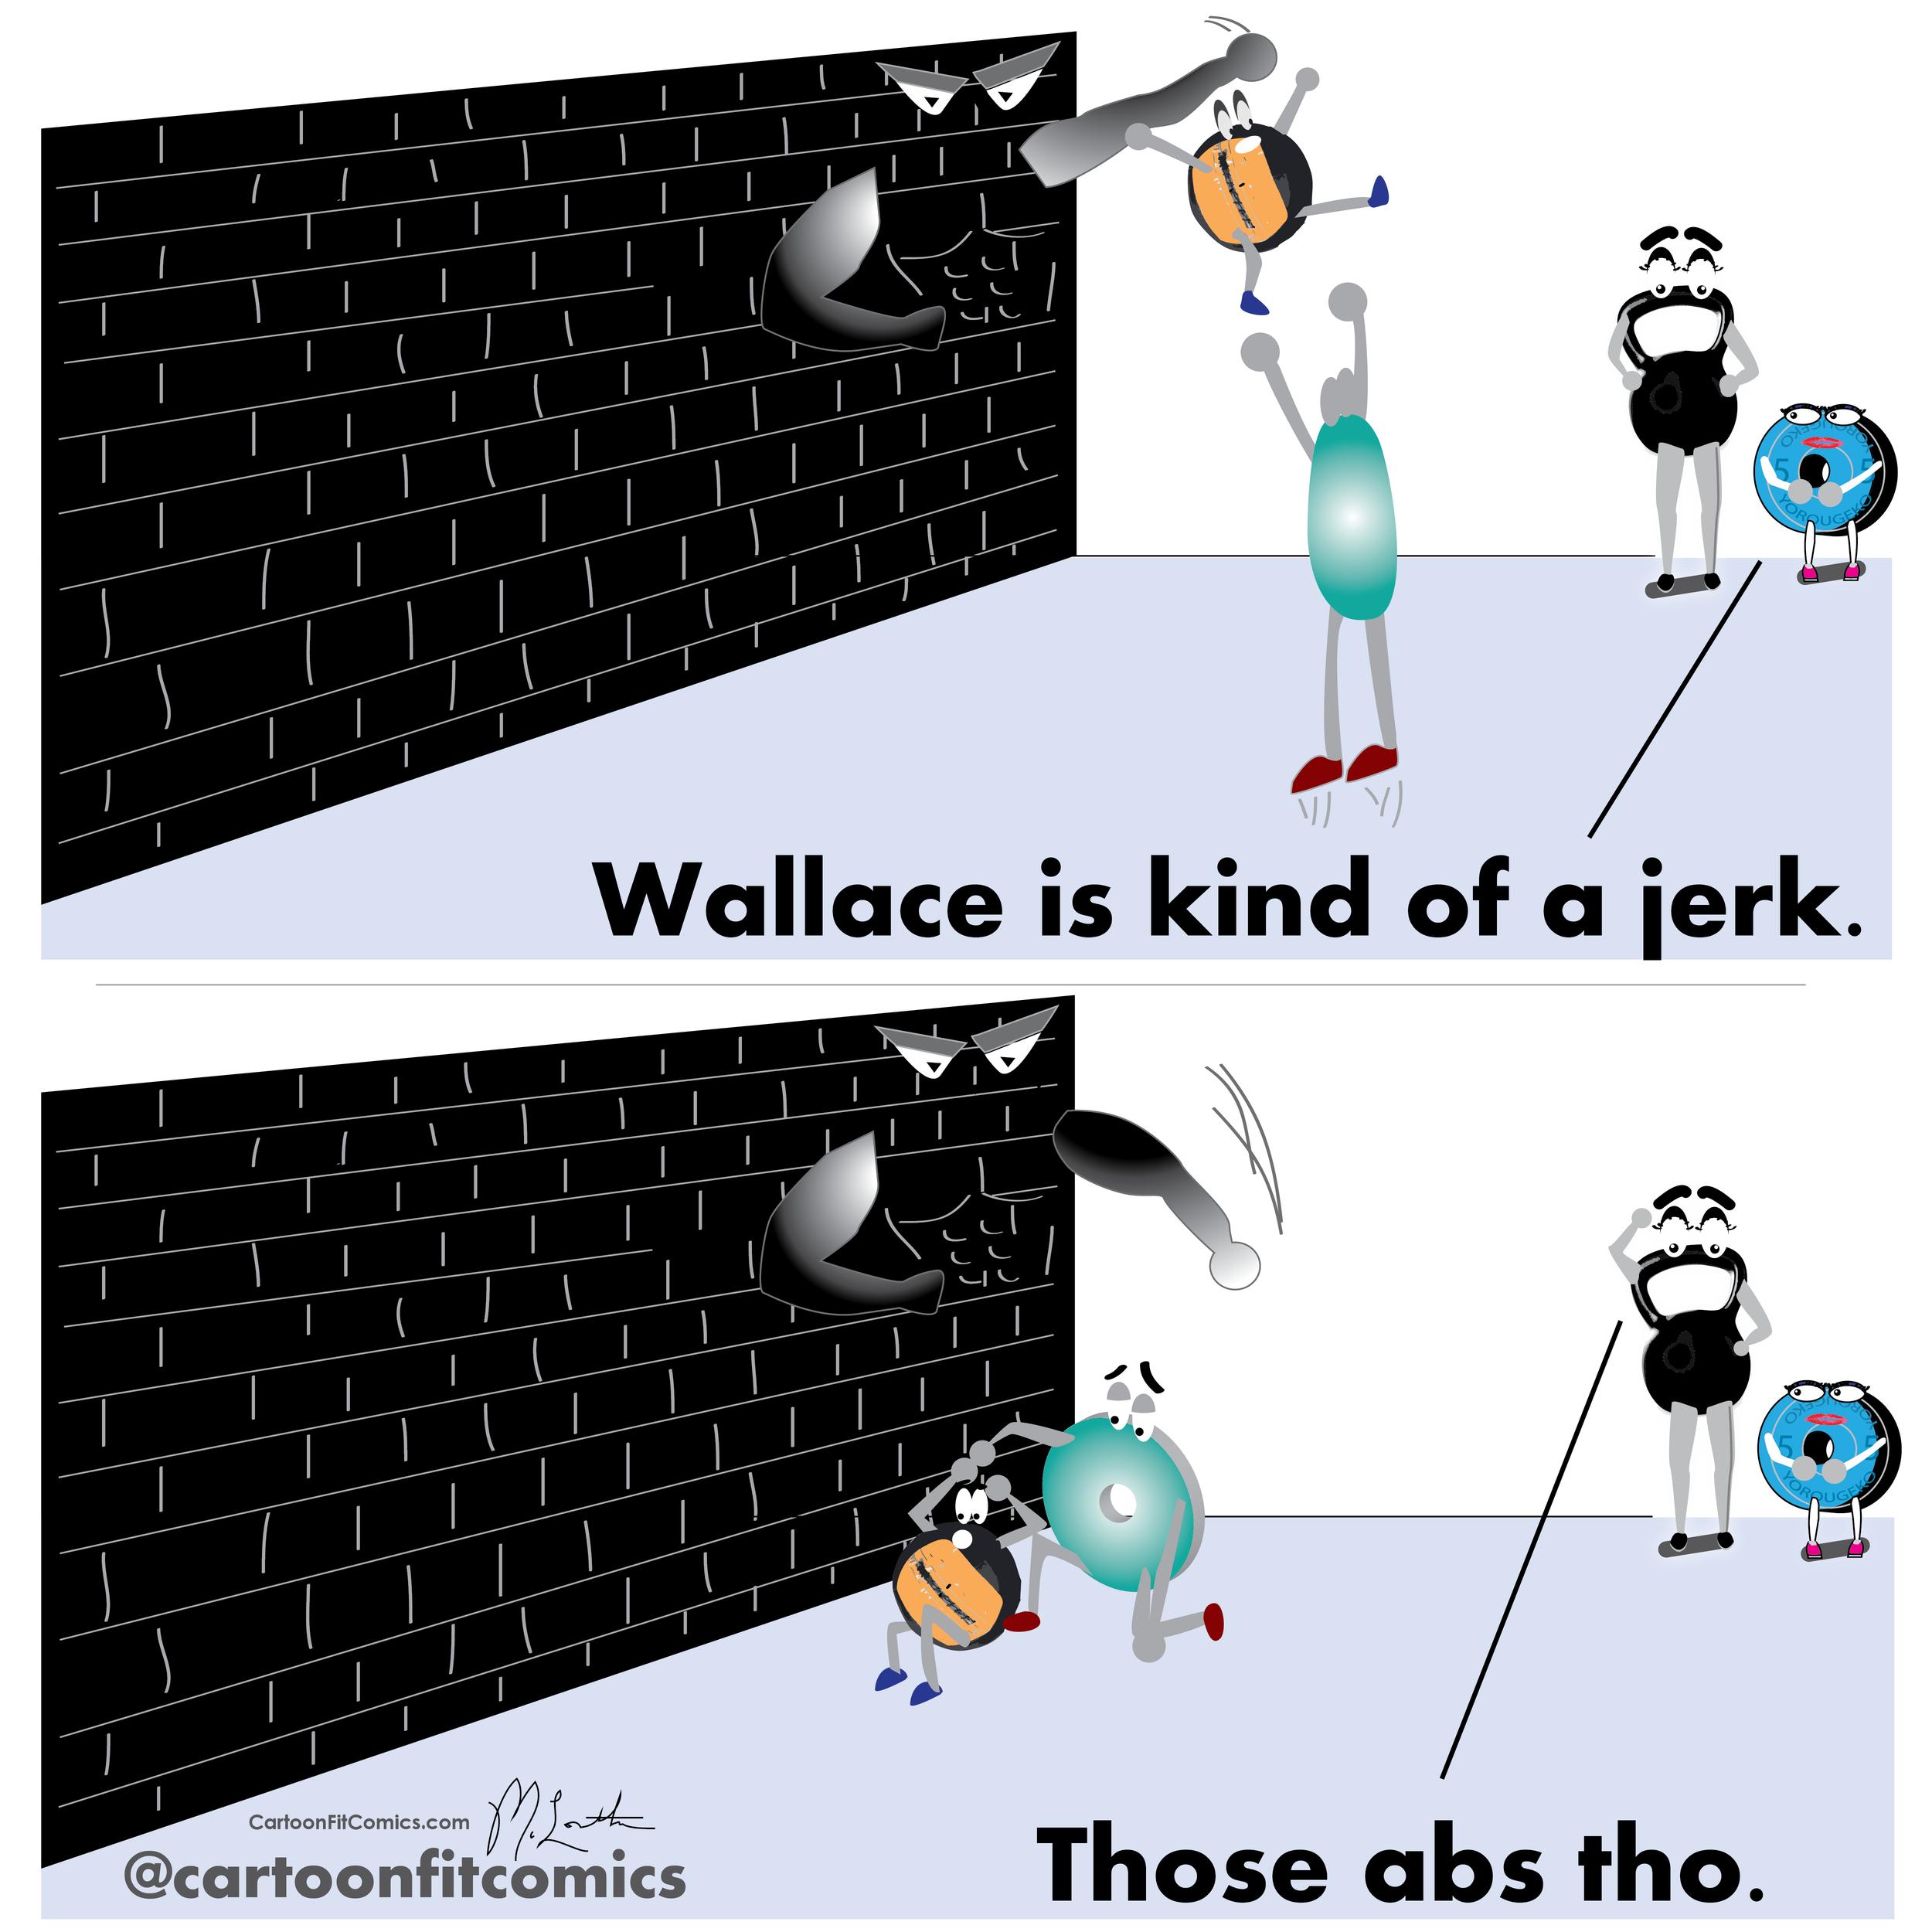 CartoonFit - Wallace - Belle - Wall Ball Rejection